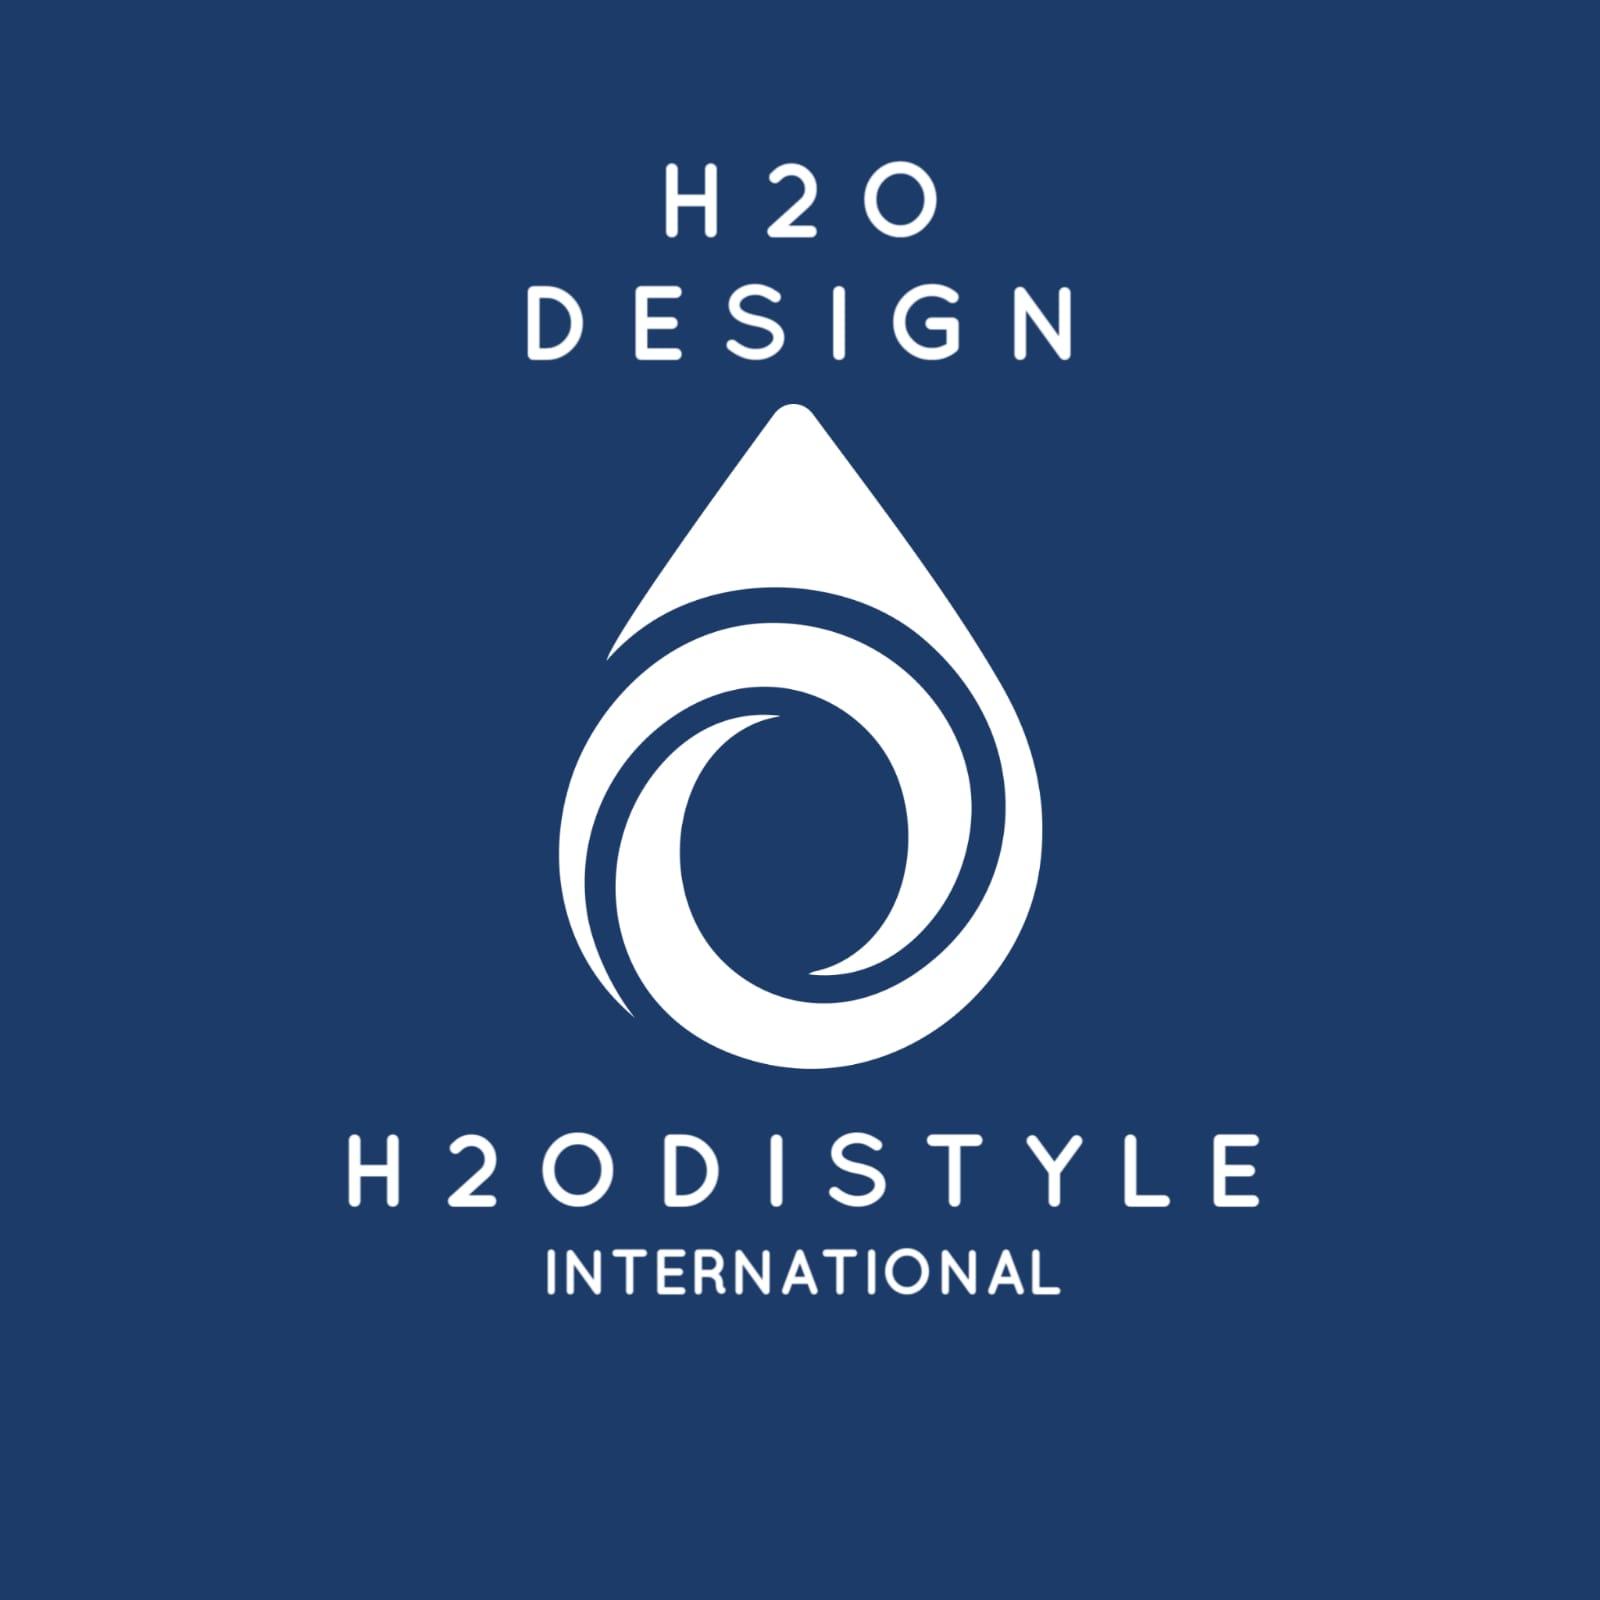 H2o Distyle